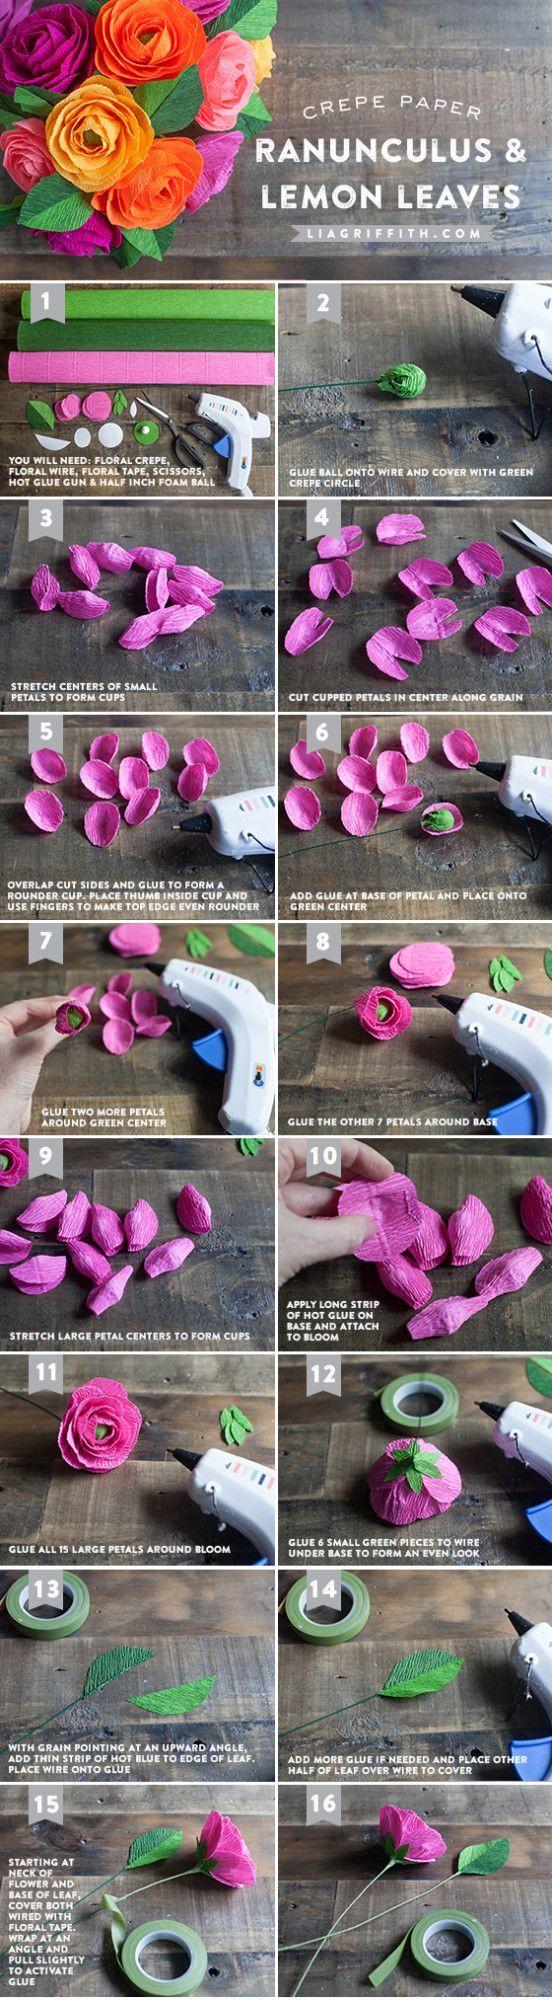 Make a Crepe Paper Ranunculus Bouquet with Lemon Leaves